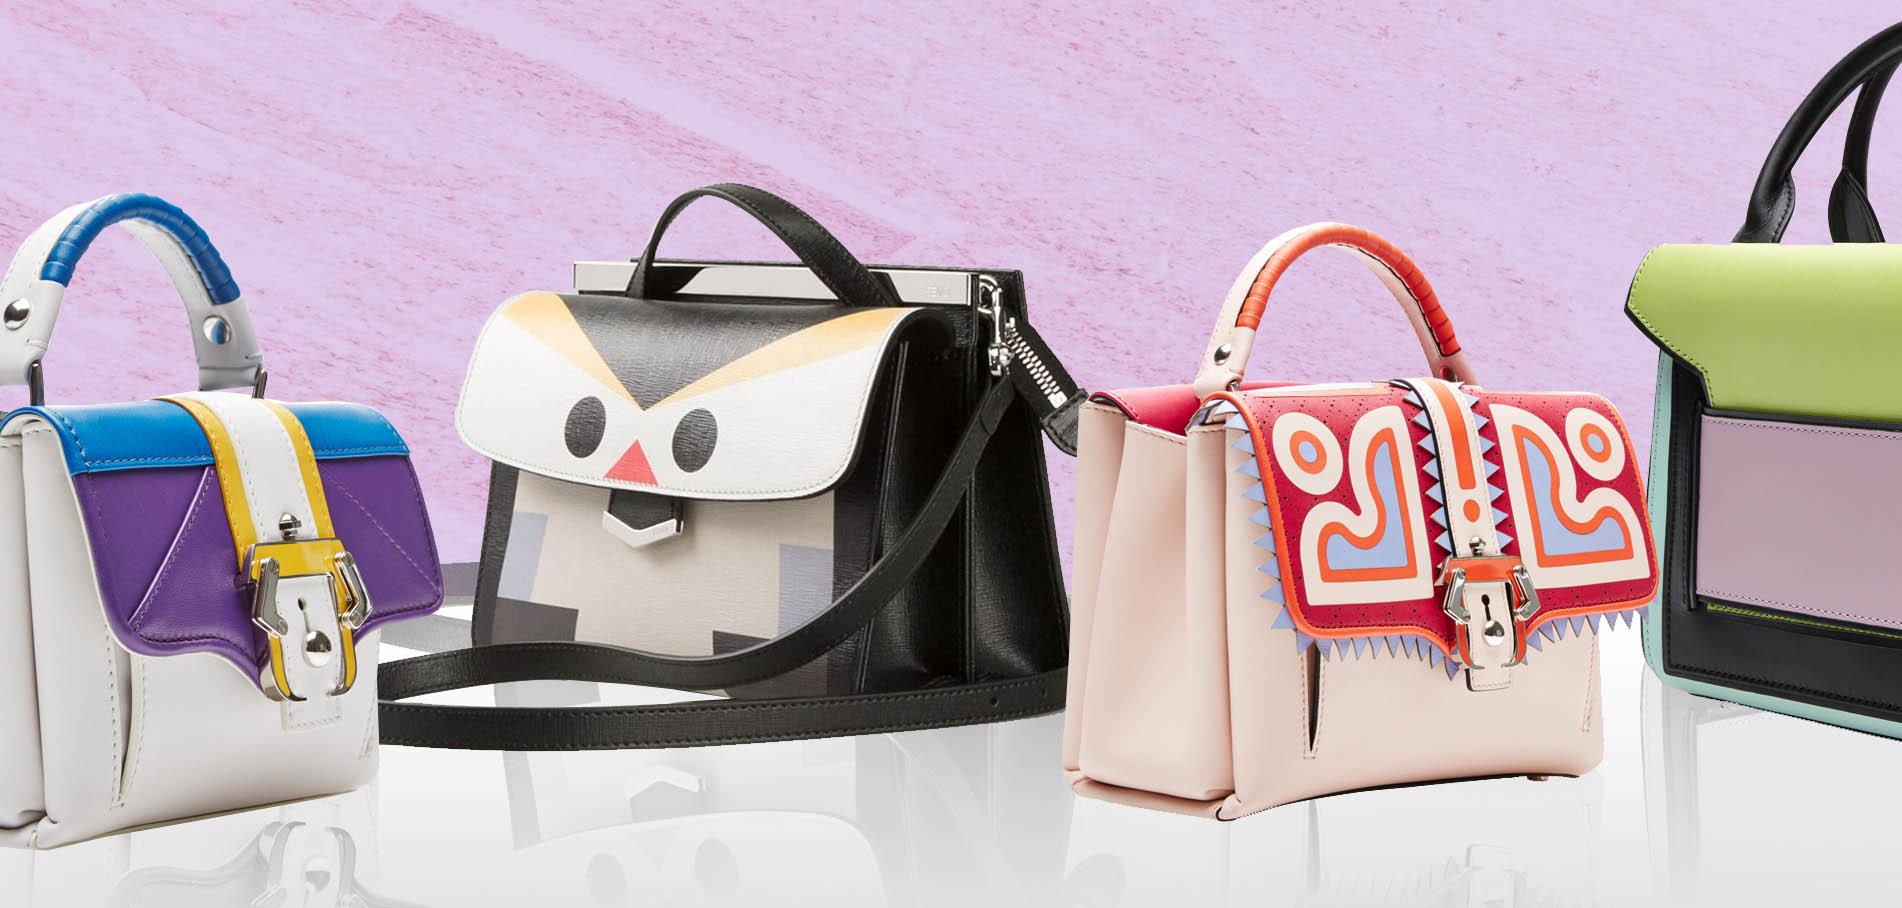 6a090ac7a7c 5 cute designer bags for Spring Summer 2015 - My Fashion Wants